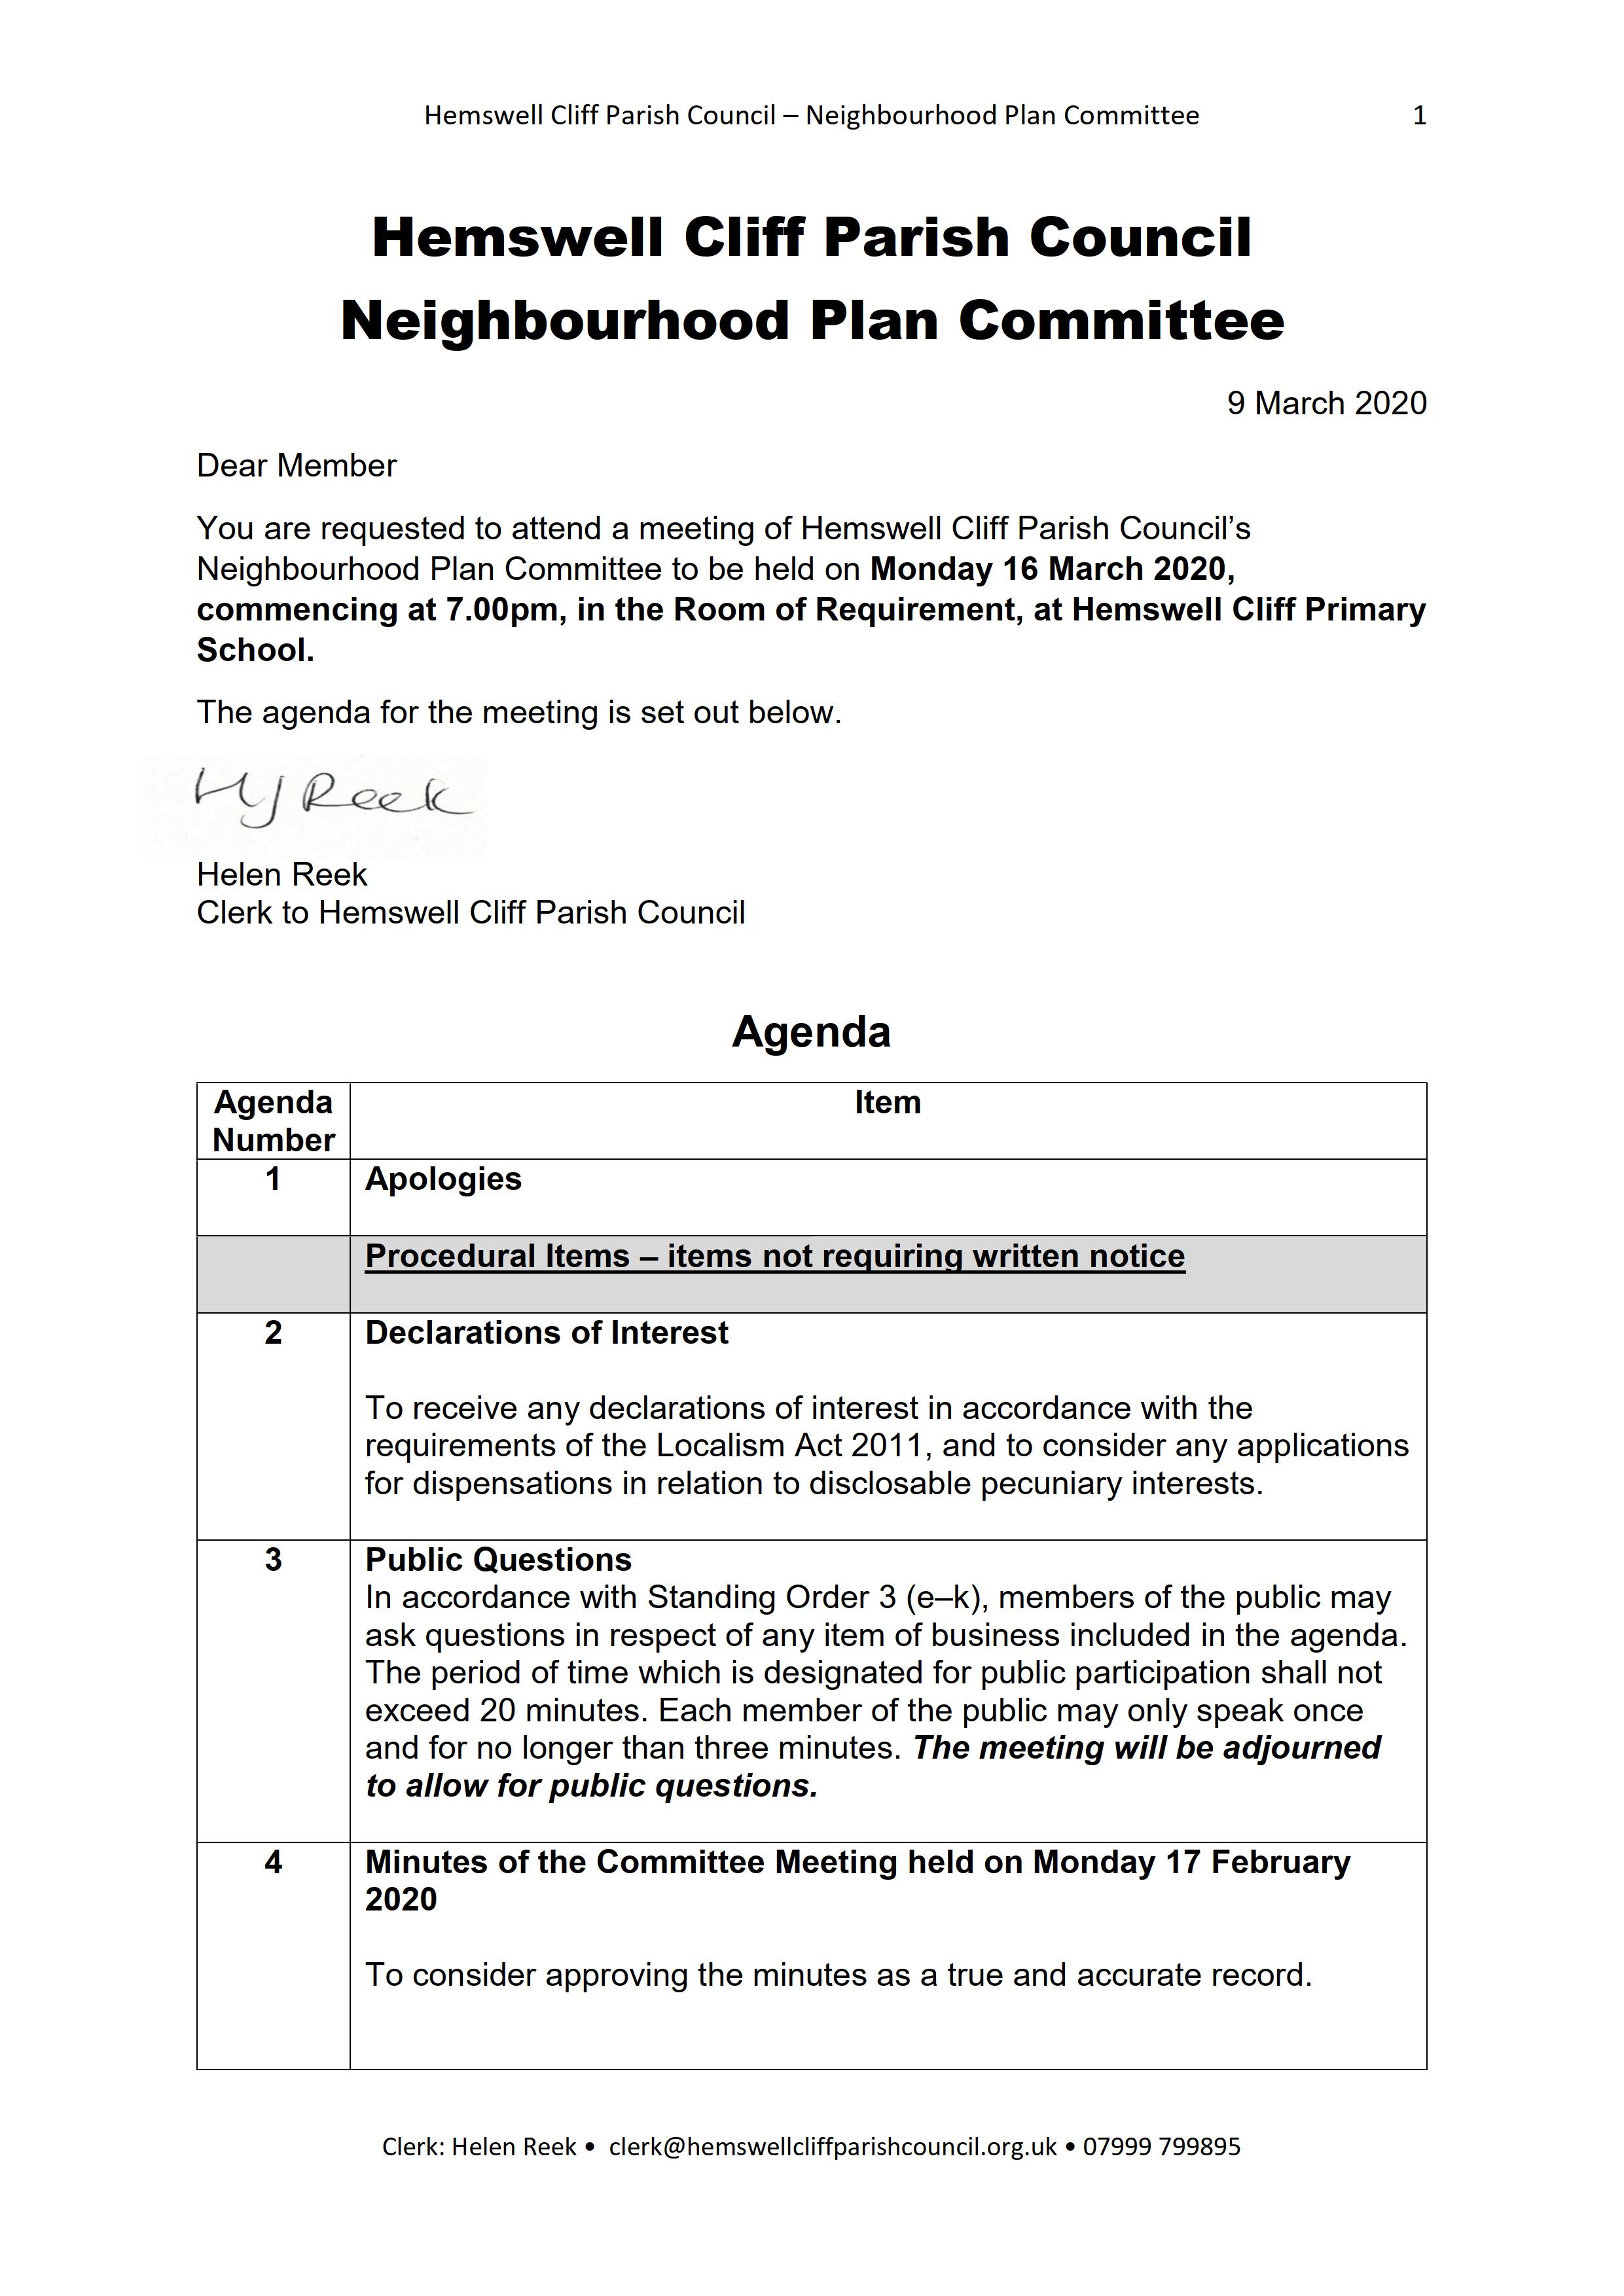 HCPC_NPC_Agenda_16.03.20_1.png